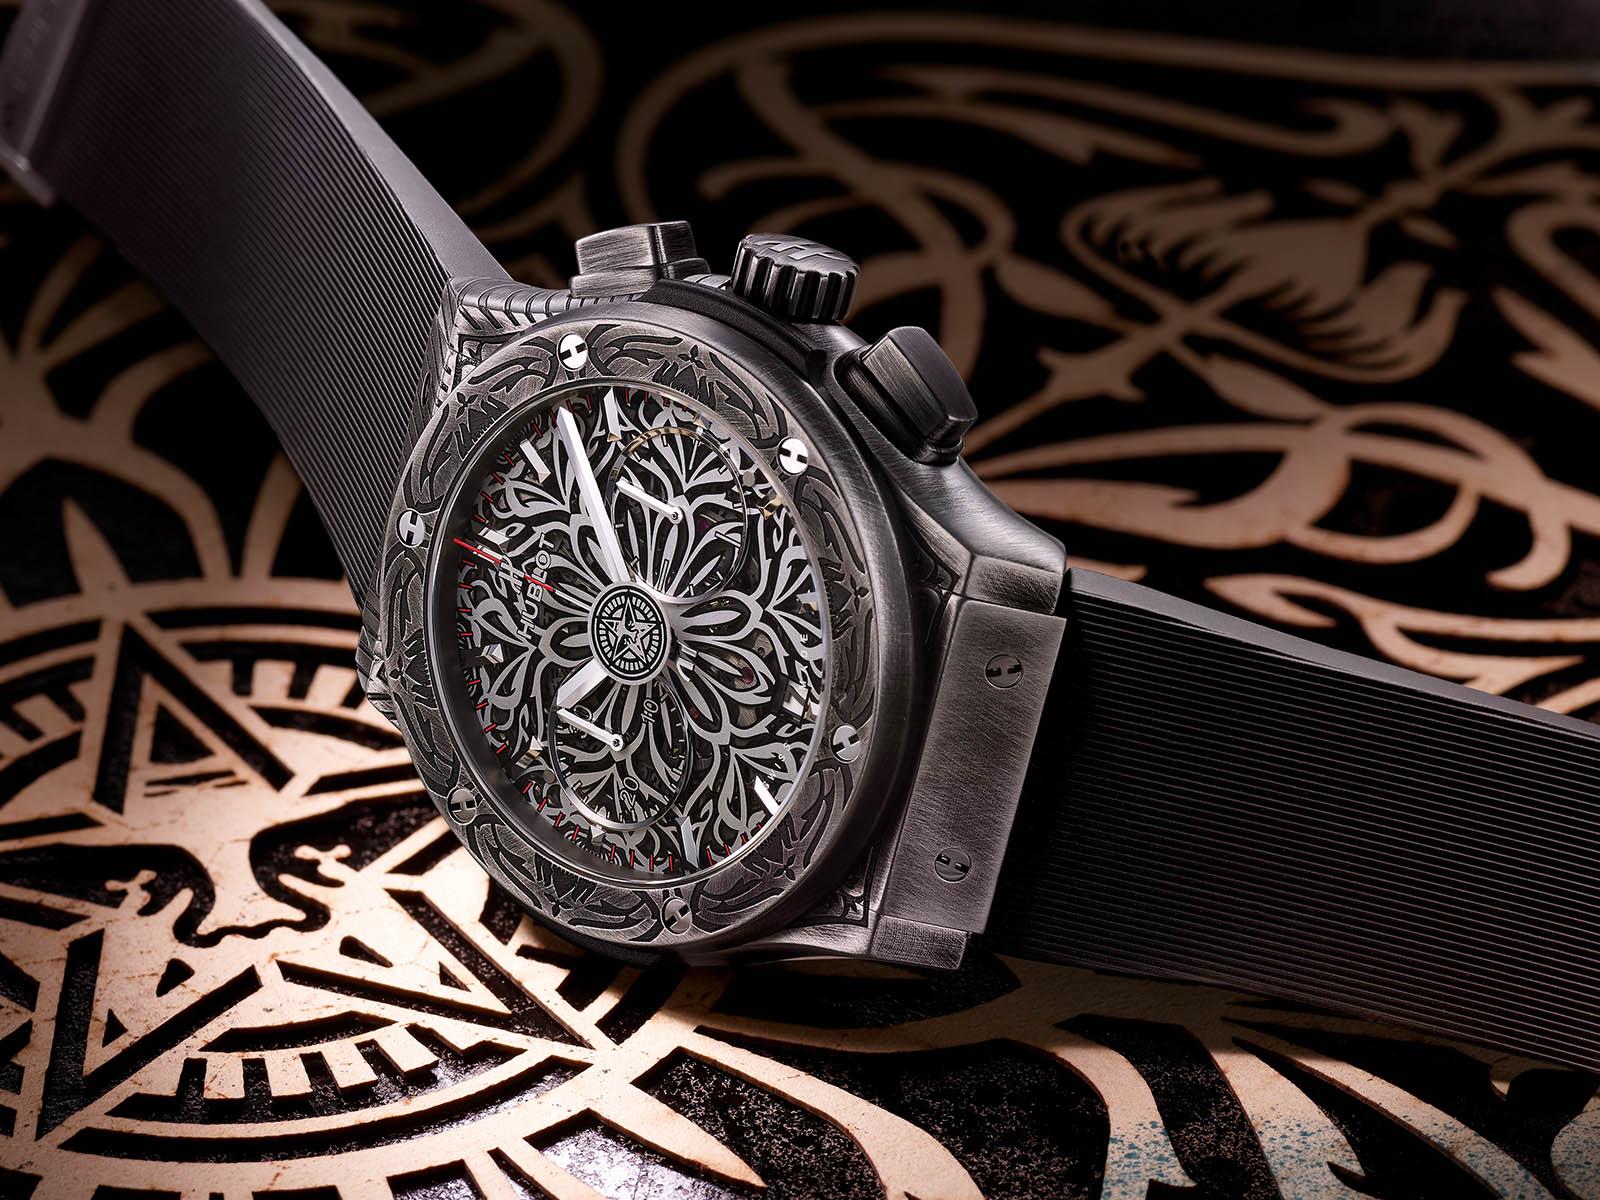 525-nx-0137-rx-shf21-hublot-classic-fusion-chronograph-shepard-fairey-4.jpg